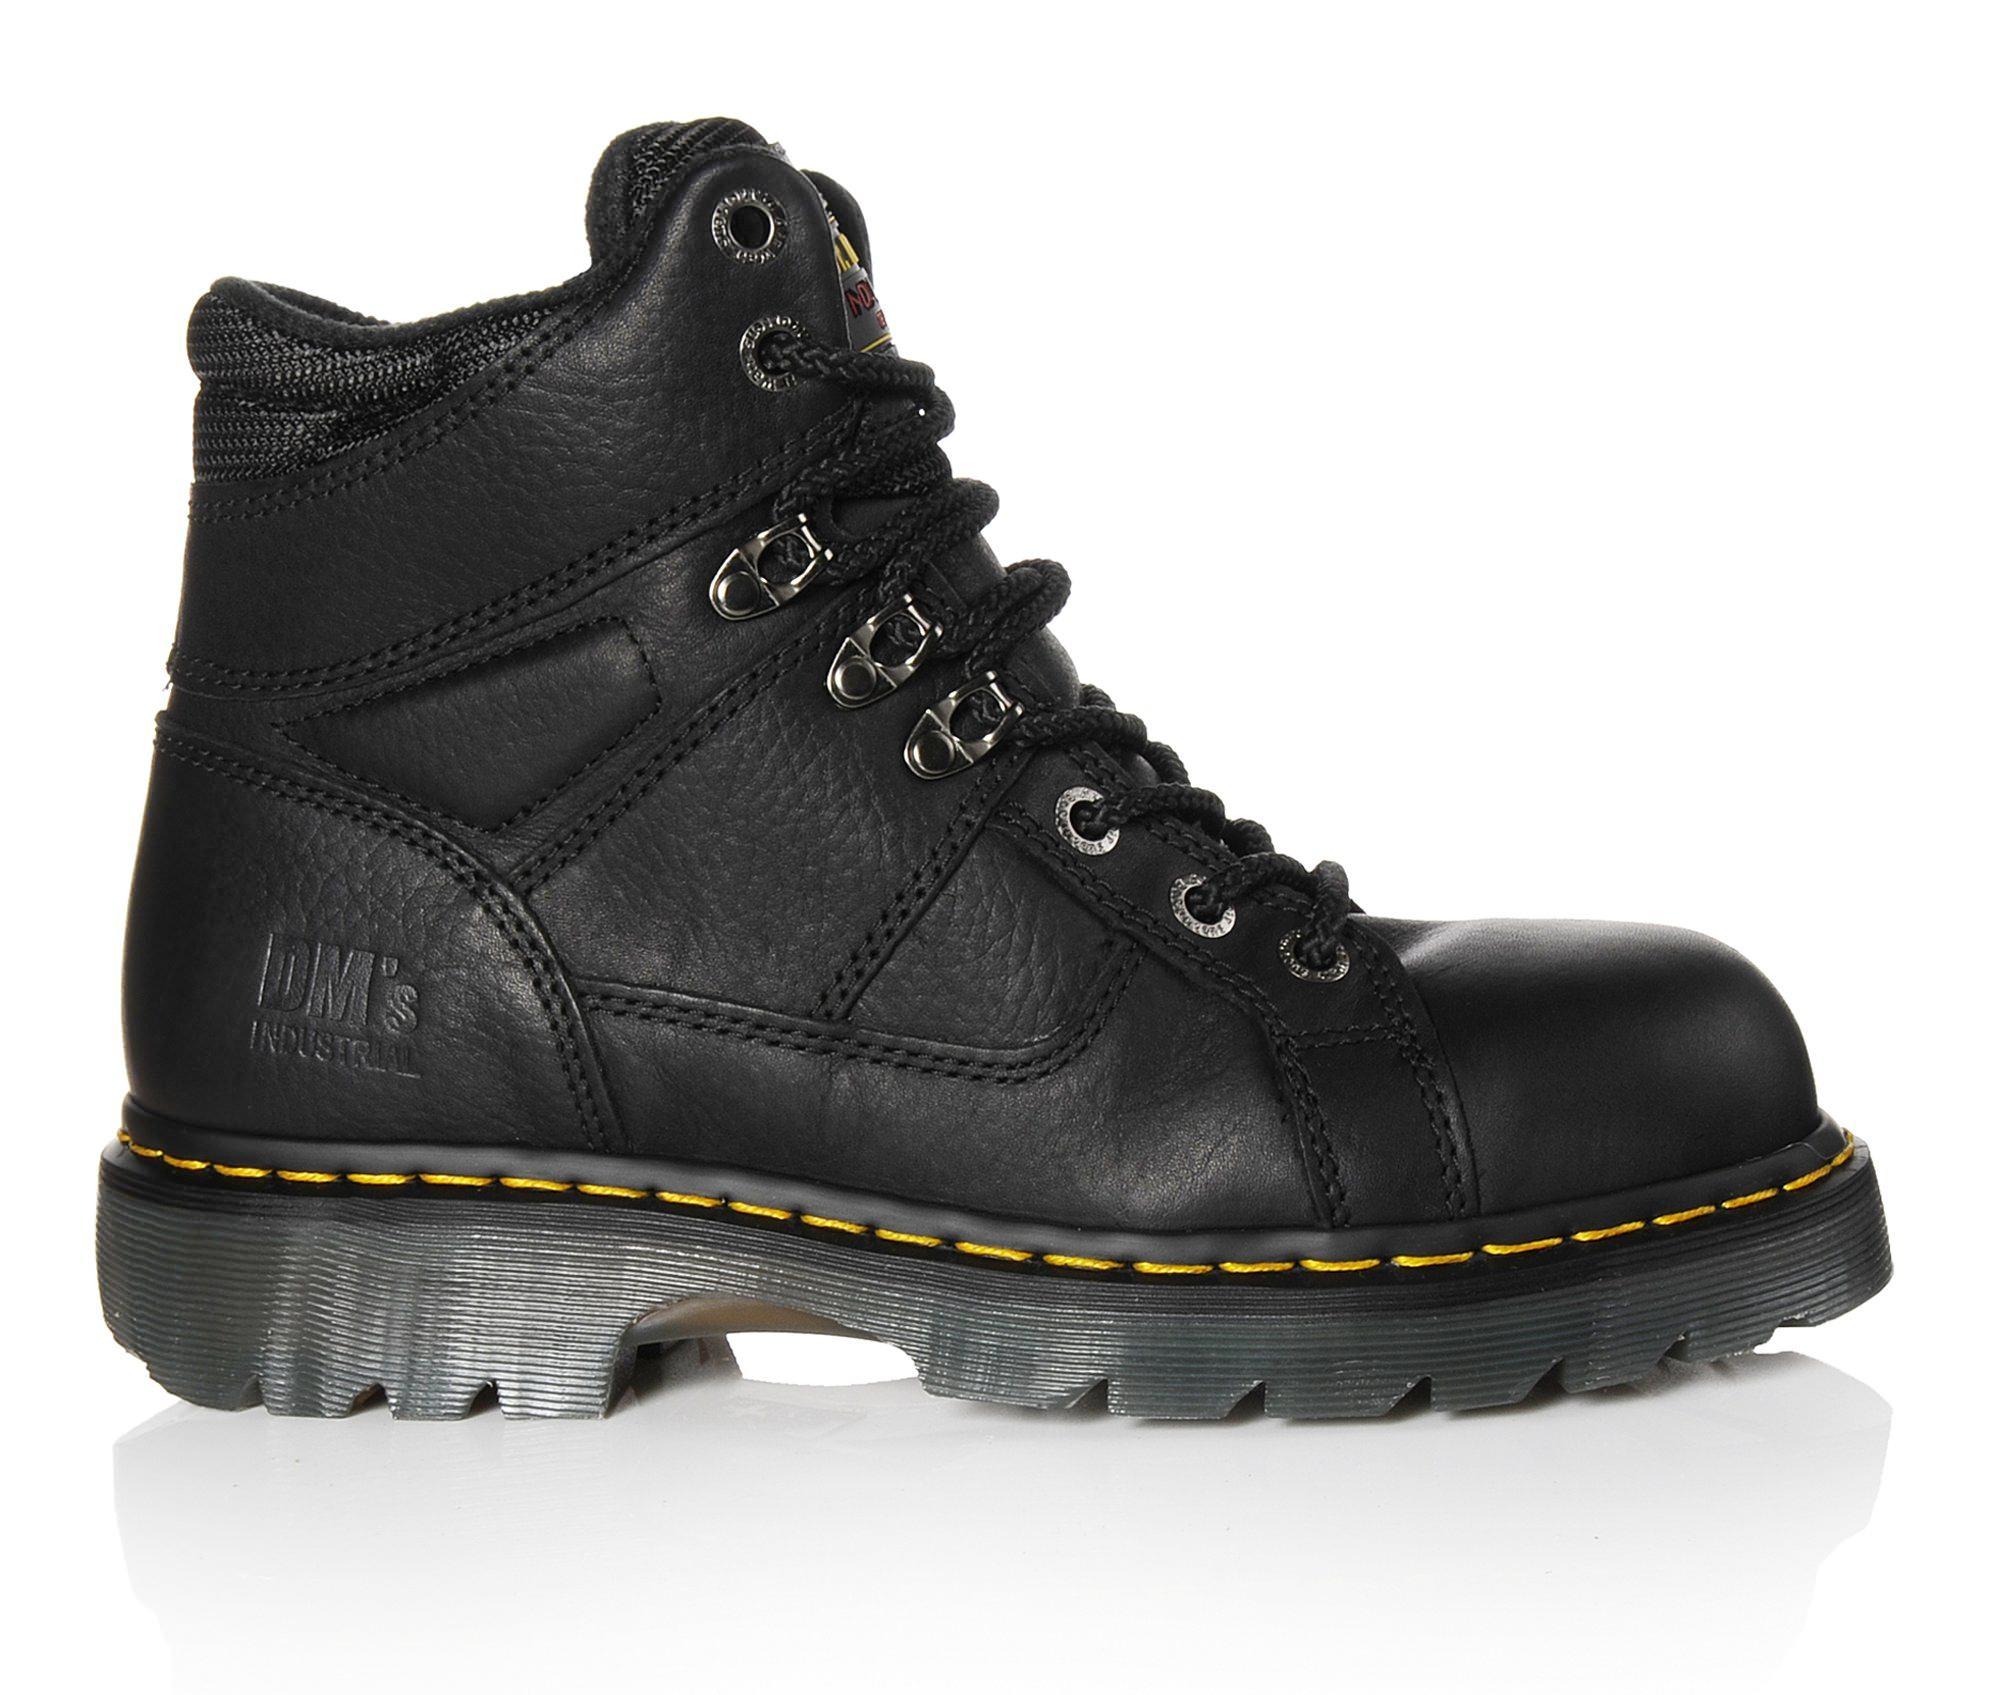 Dr. Martens Industrial Ironbridge 6 In Steel Toe Men's Boots (Black Leather)